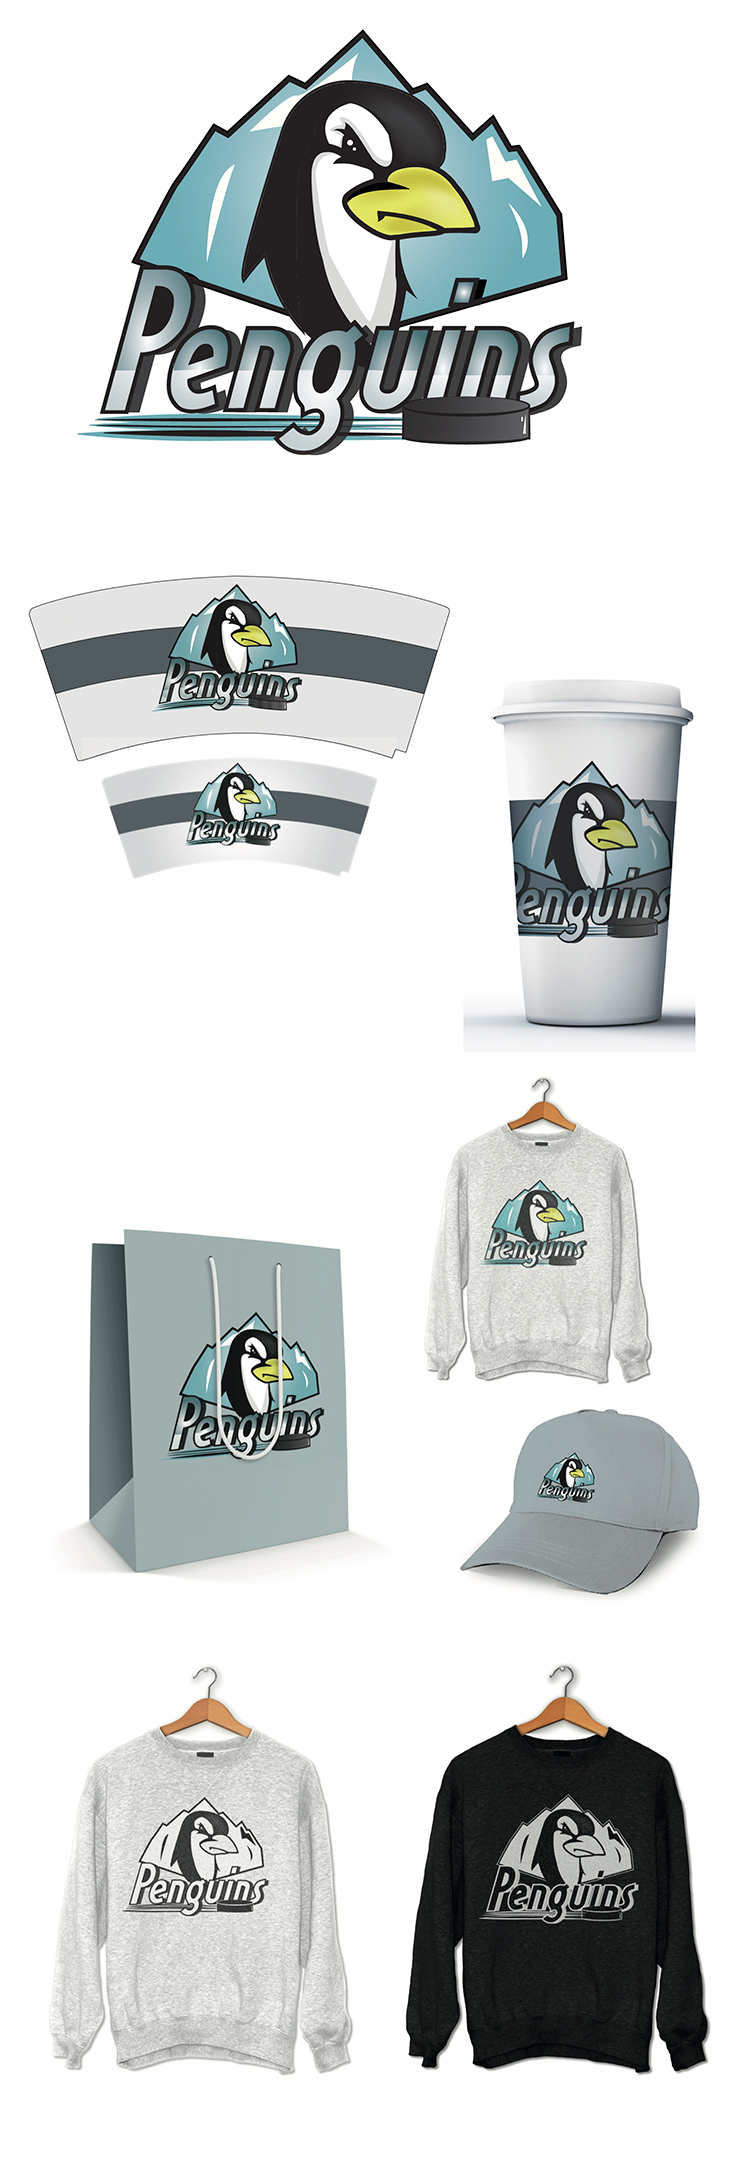 penguins logo